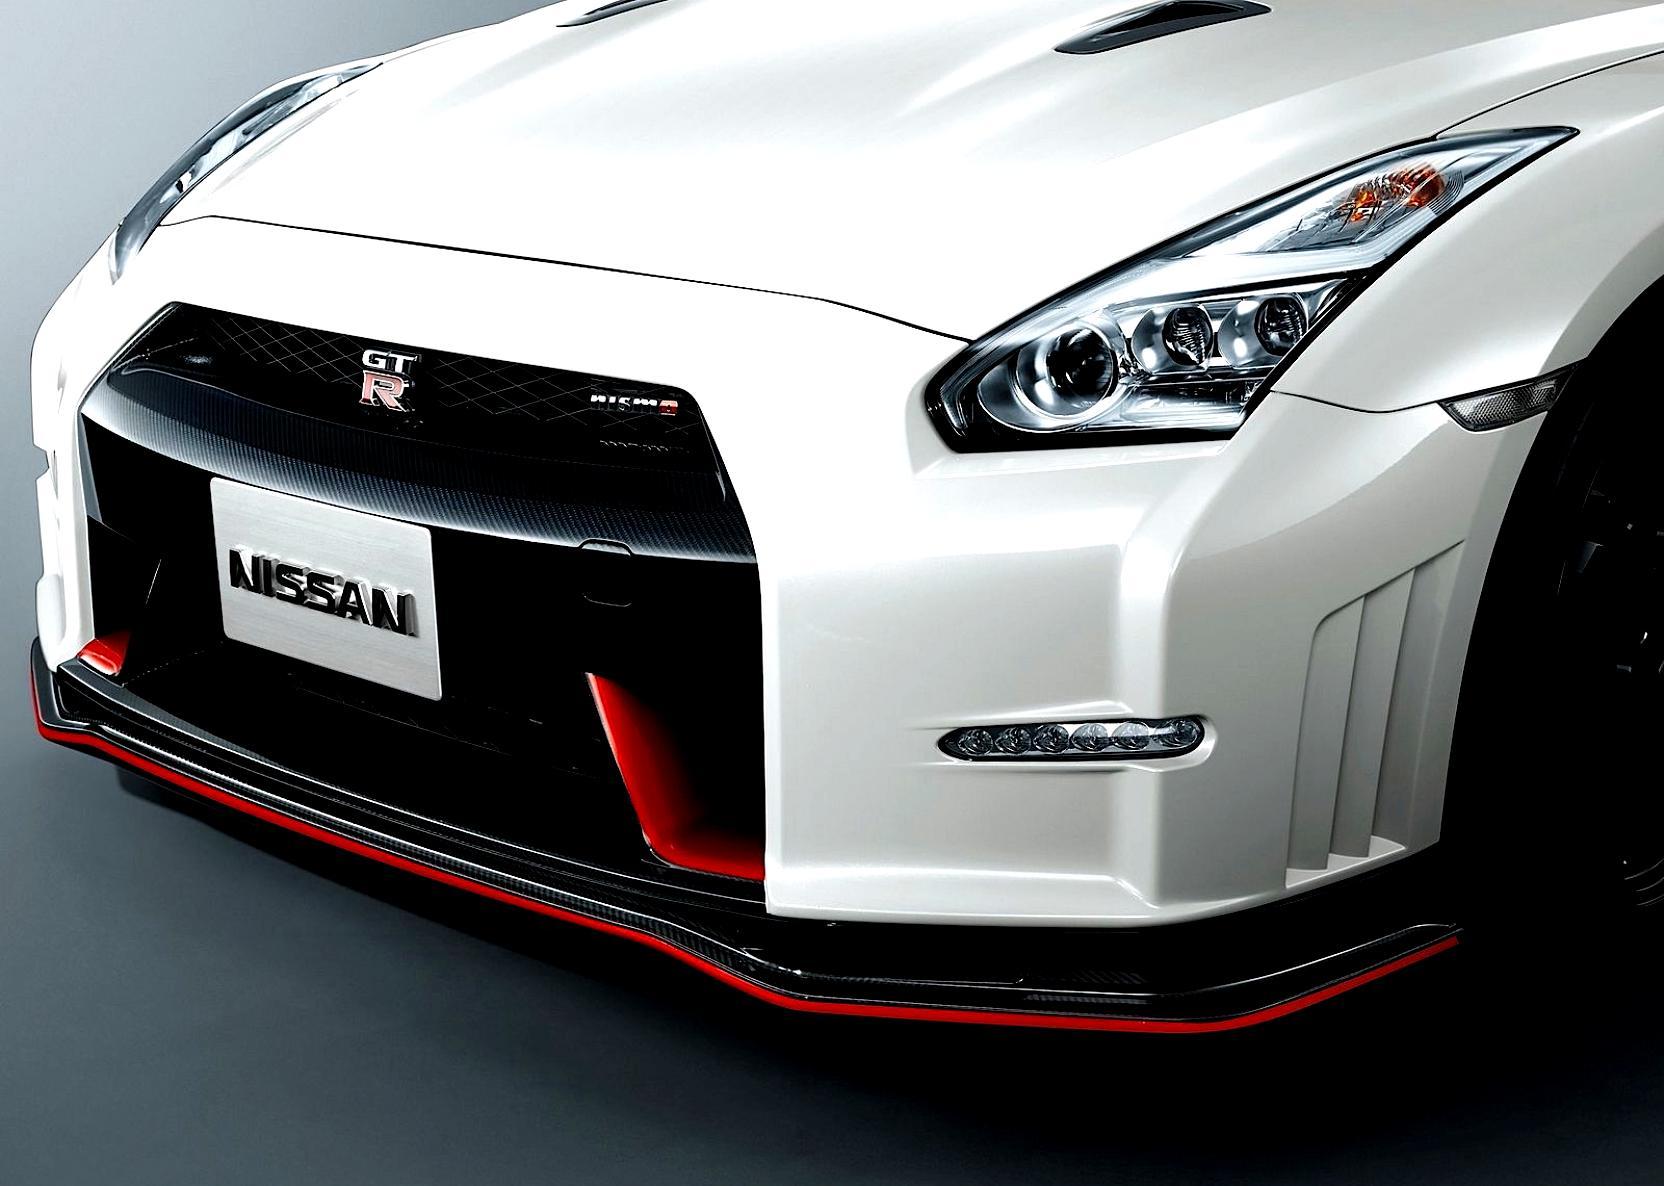 2013 Nissan Juke Tire Size >> Nissan GT-R R35 Nismo 2014 on MotoImg.com